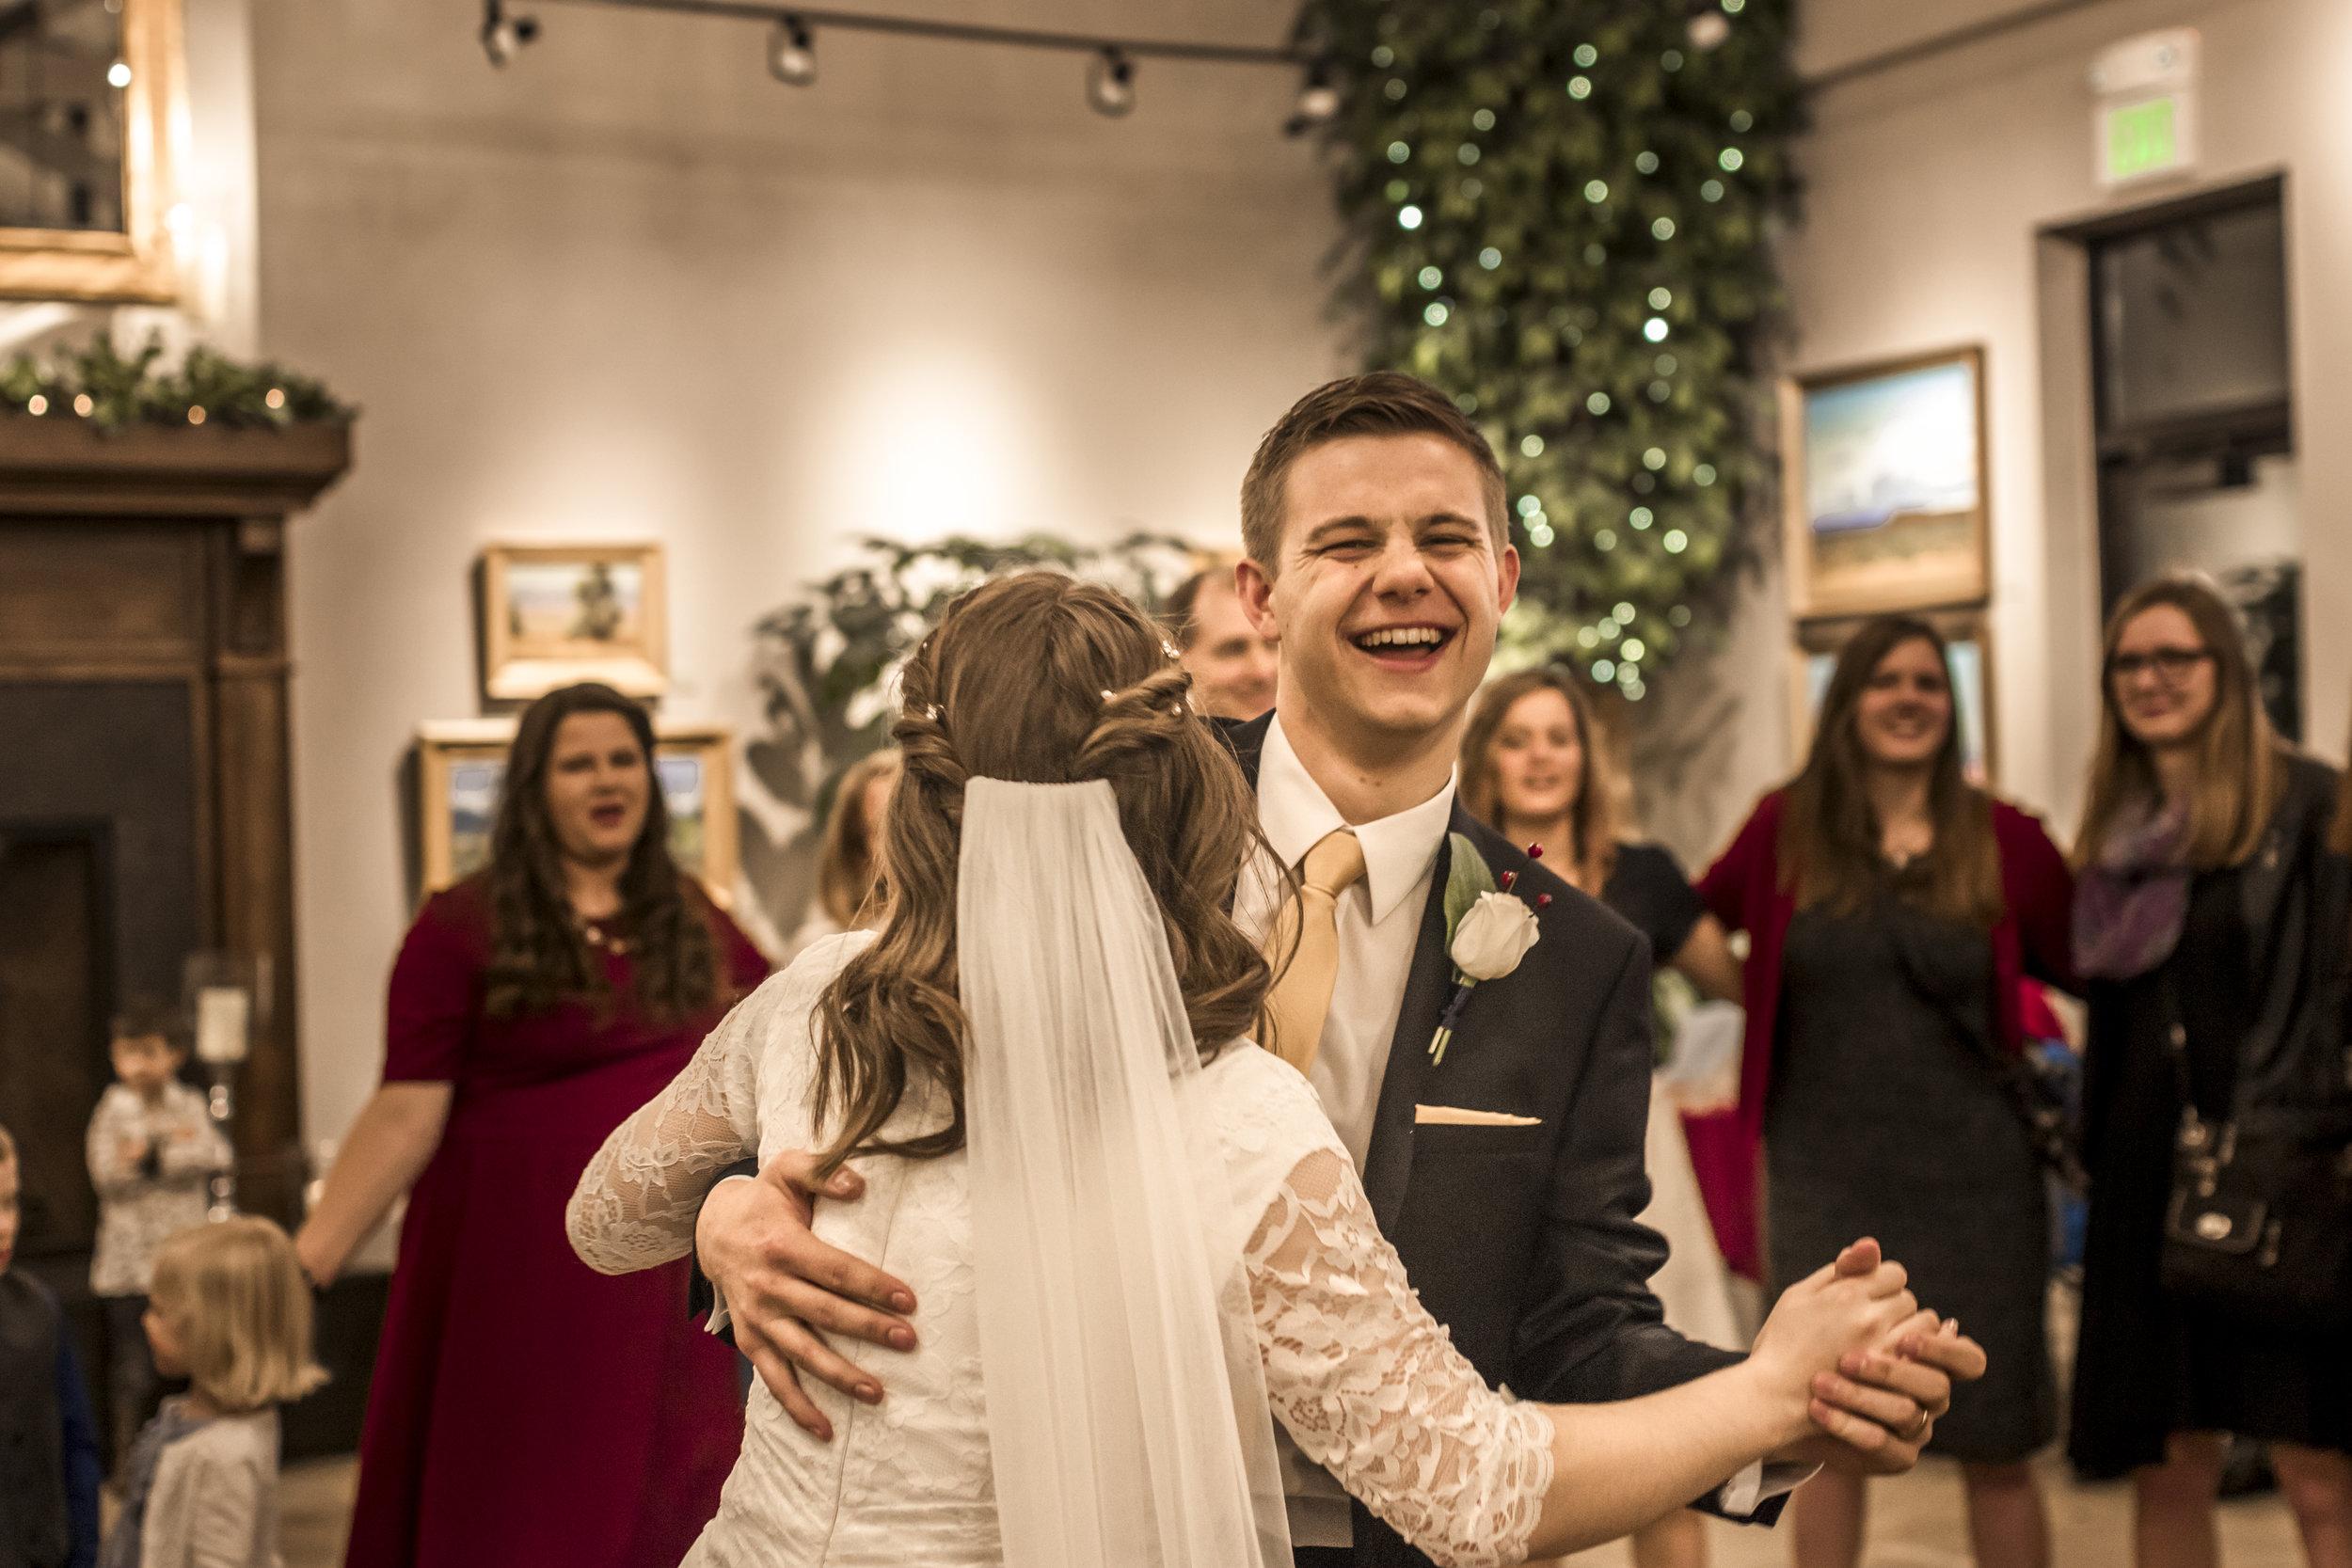 BBPhotoIvy House Salt Lake CityUtah winter wedding reception08.JPG